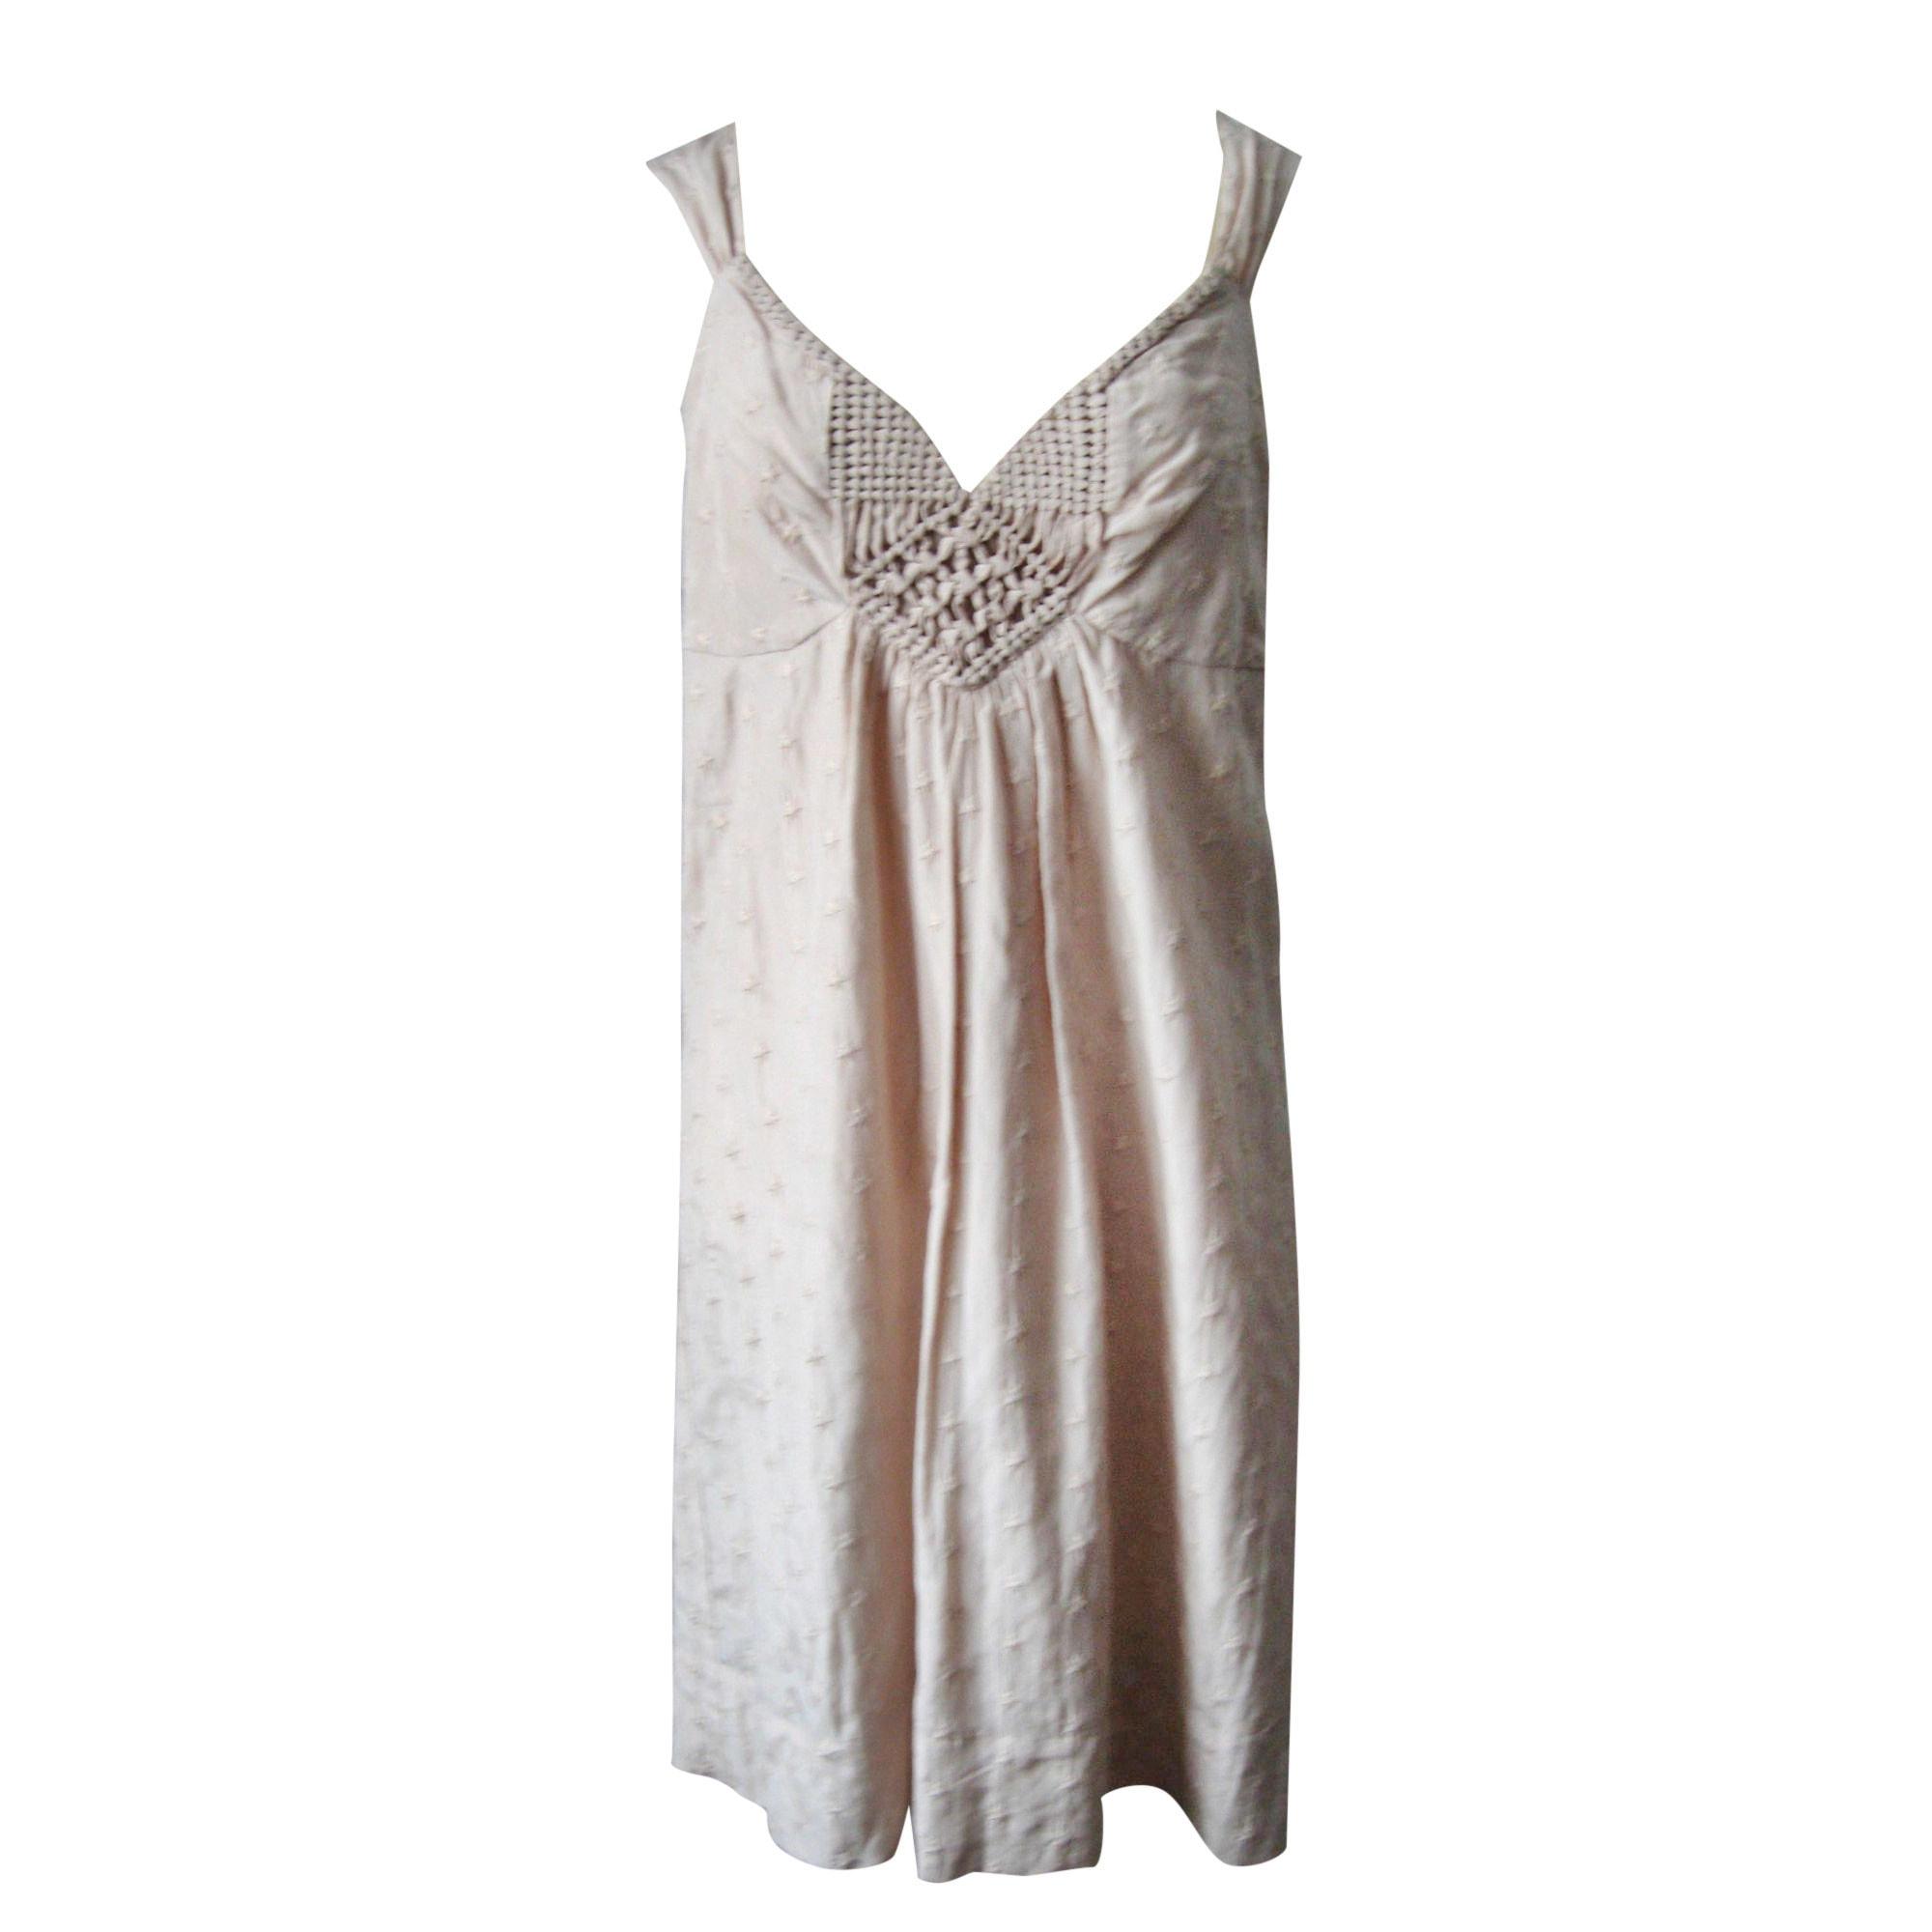 Mini-Kleid PABLO PAR GÉRARD DAREL Beige rosé nude